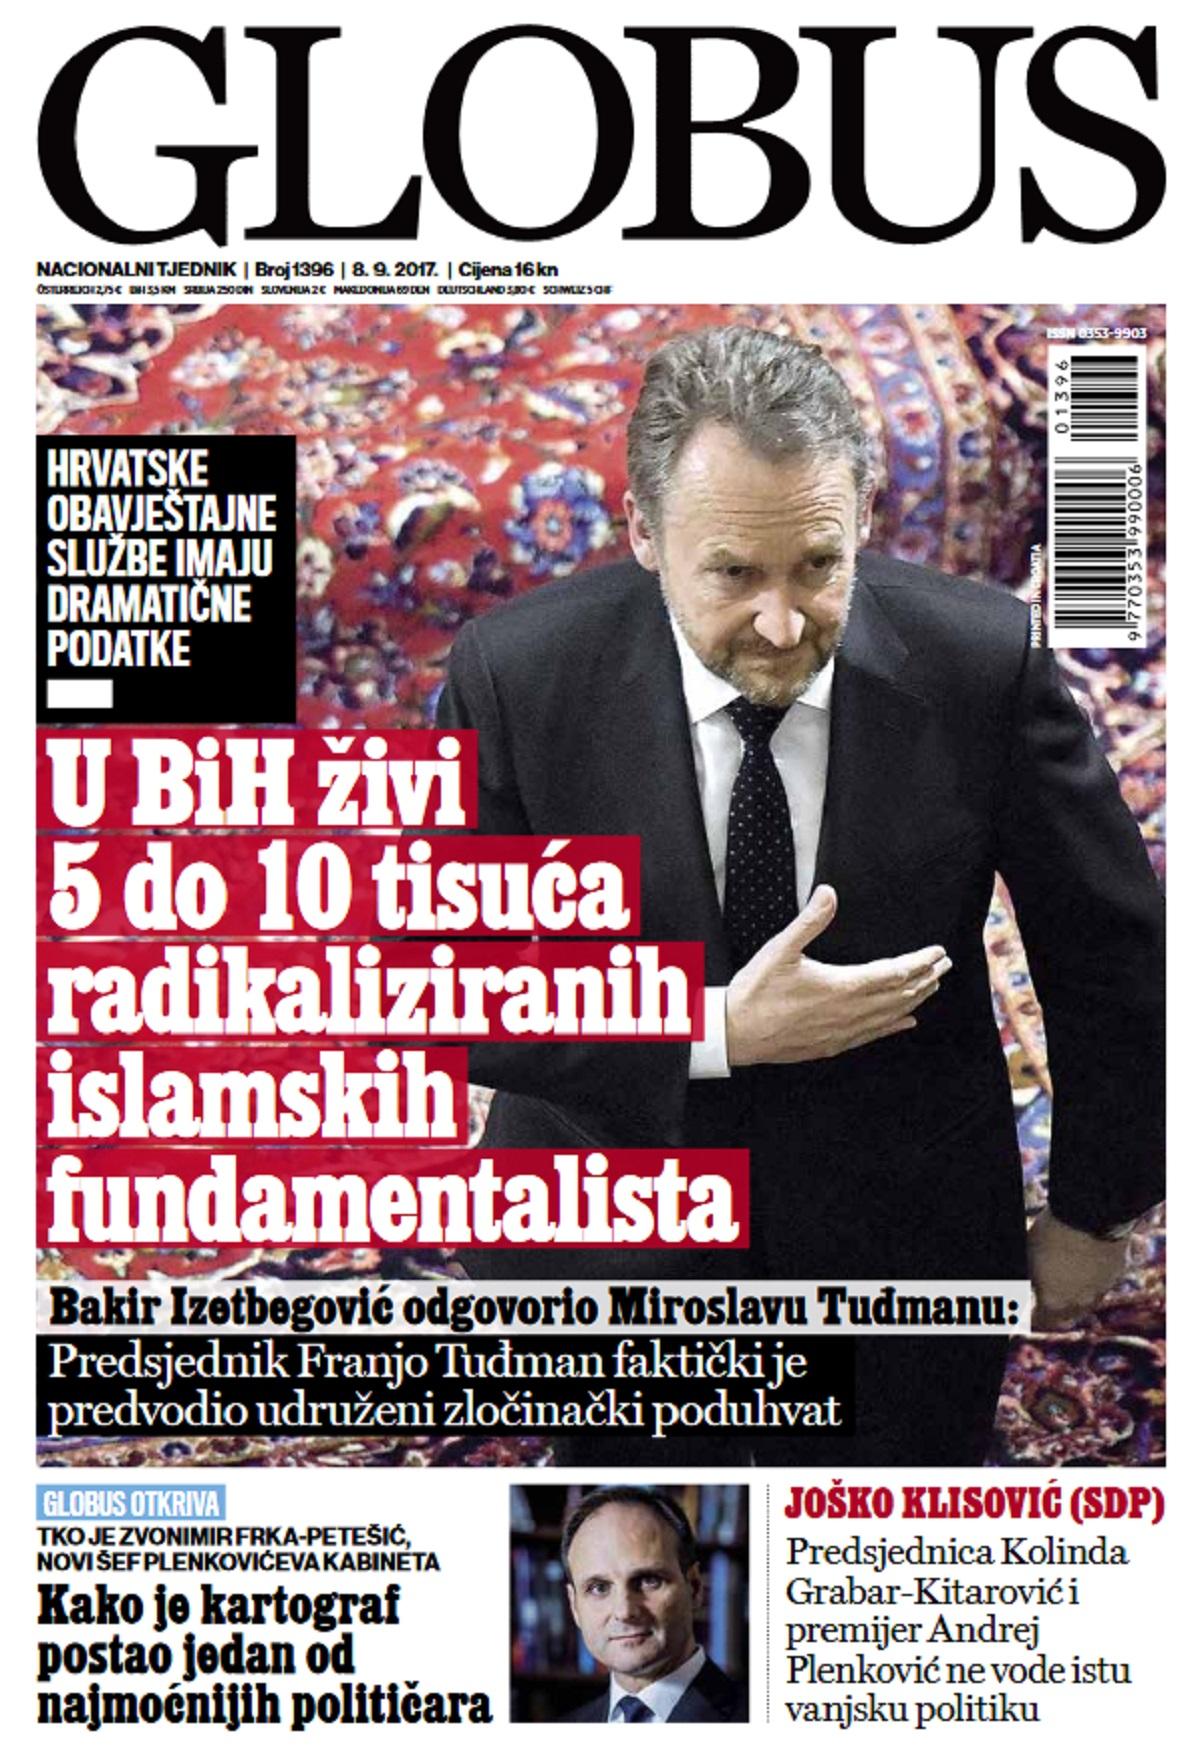 Globus, izdanje za subotu (8. rujna 2017.)